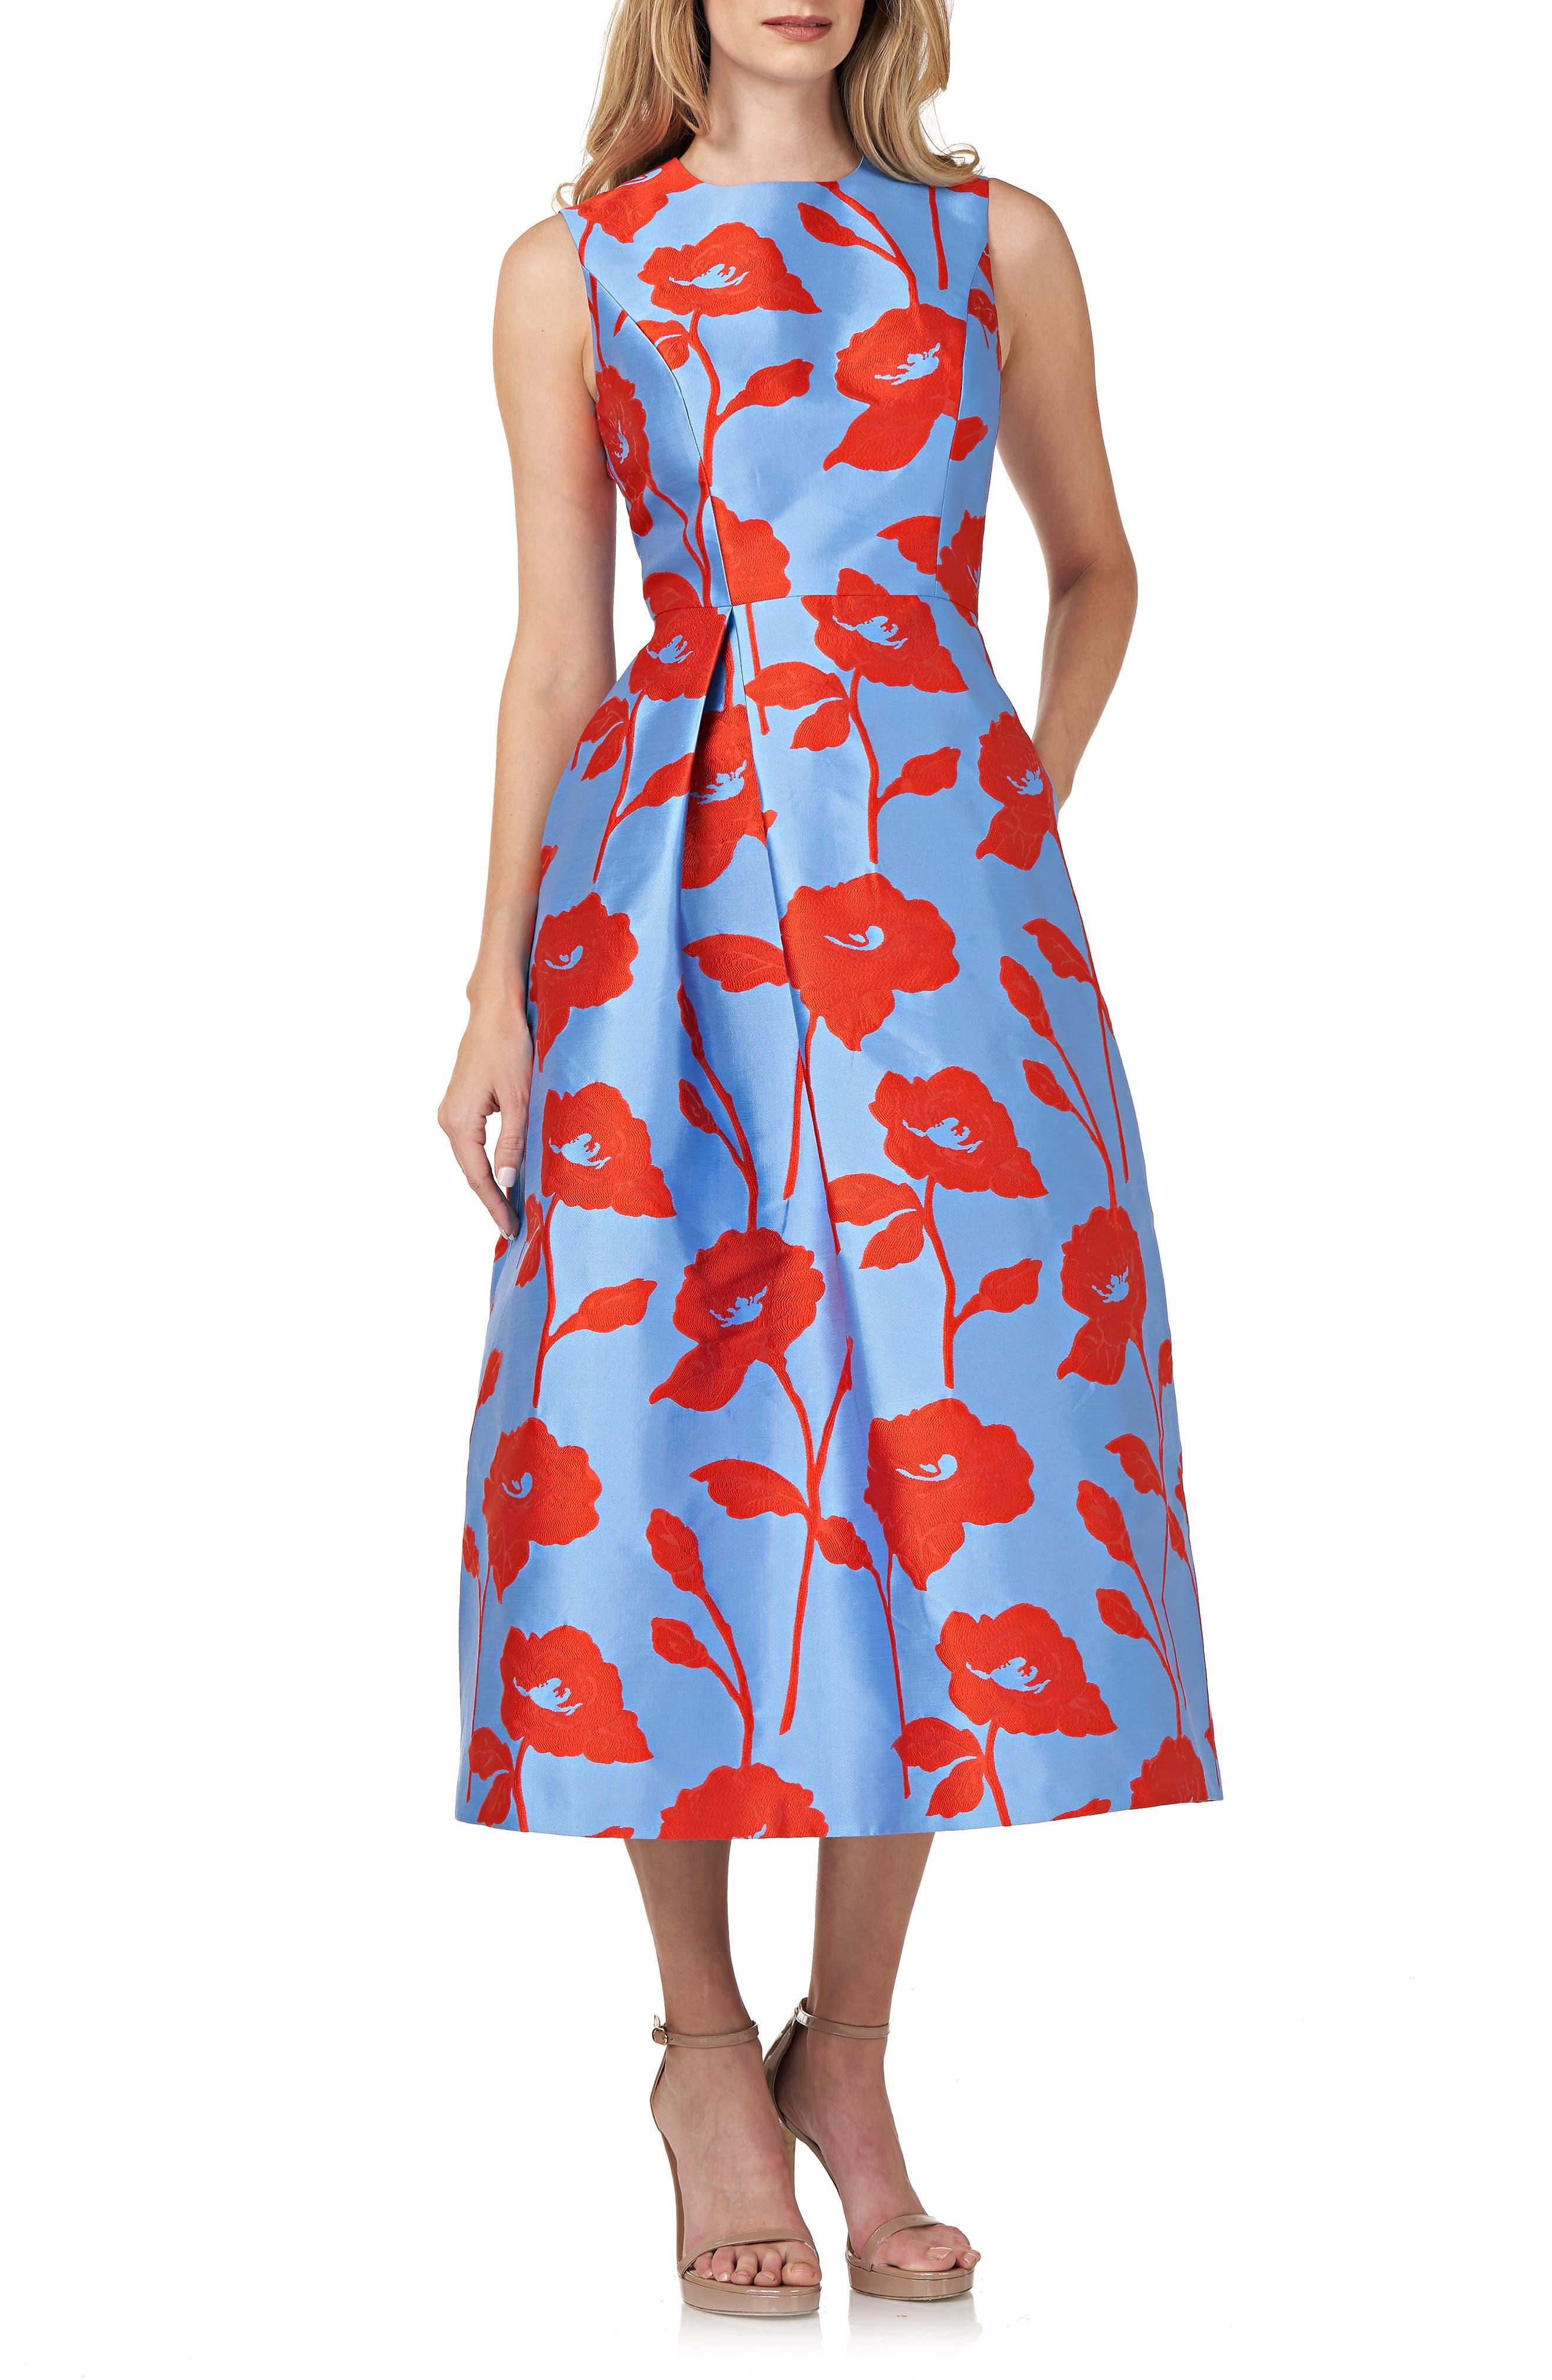 Floral Satin Jacquard Cocktail Dress